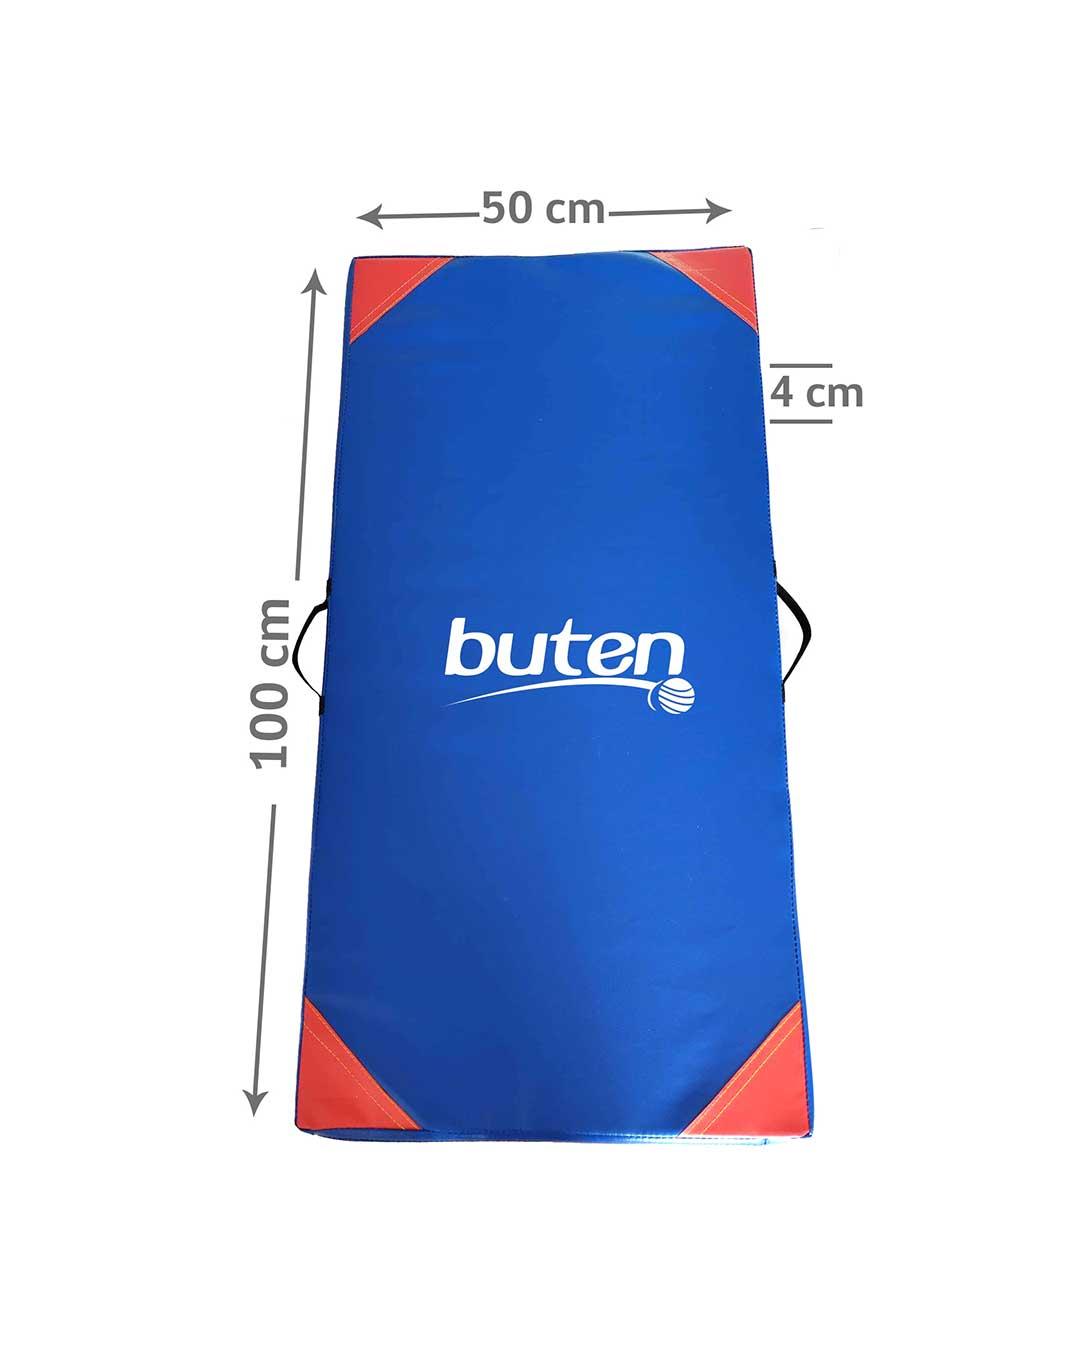 Colchoneta para ejercicio (100x50x4cm) marca BUTEN - PVC - Chile